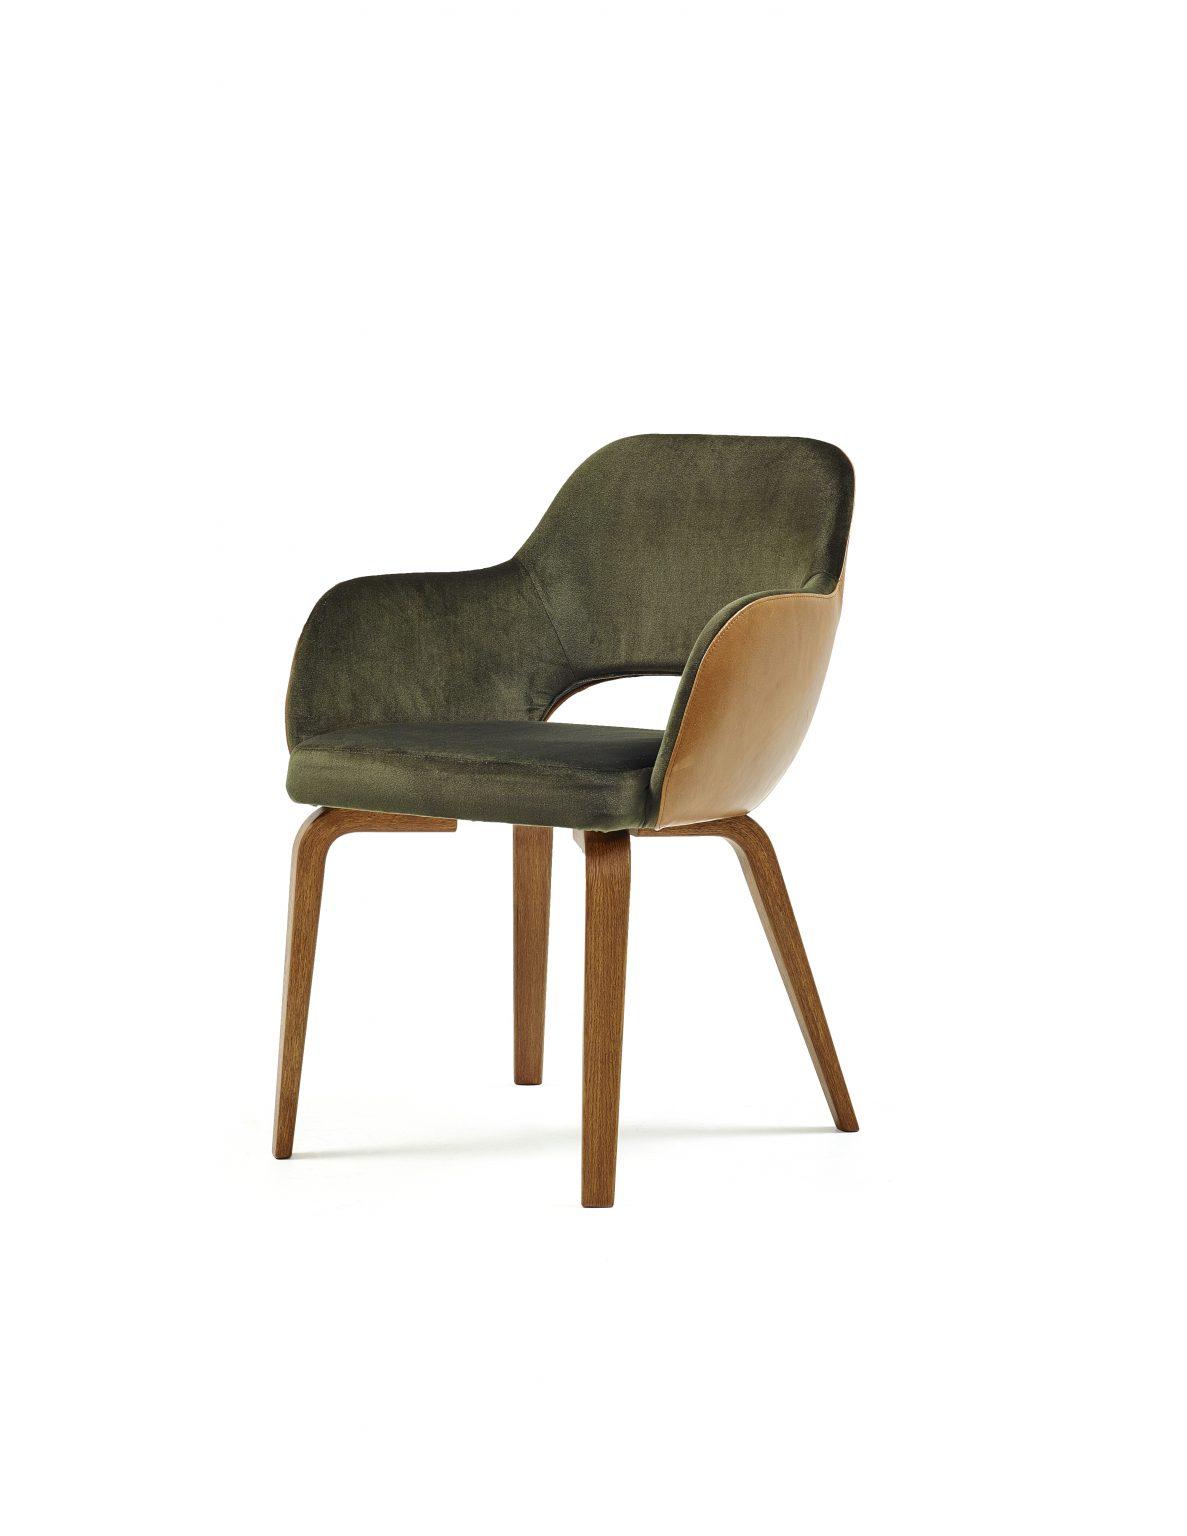 Biennale Interieur - Belgium's leading design and interior event - Messeyne-chair_leather-habano-fabric-green_feet-walnut_-5.jpg